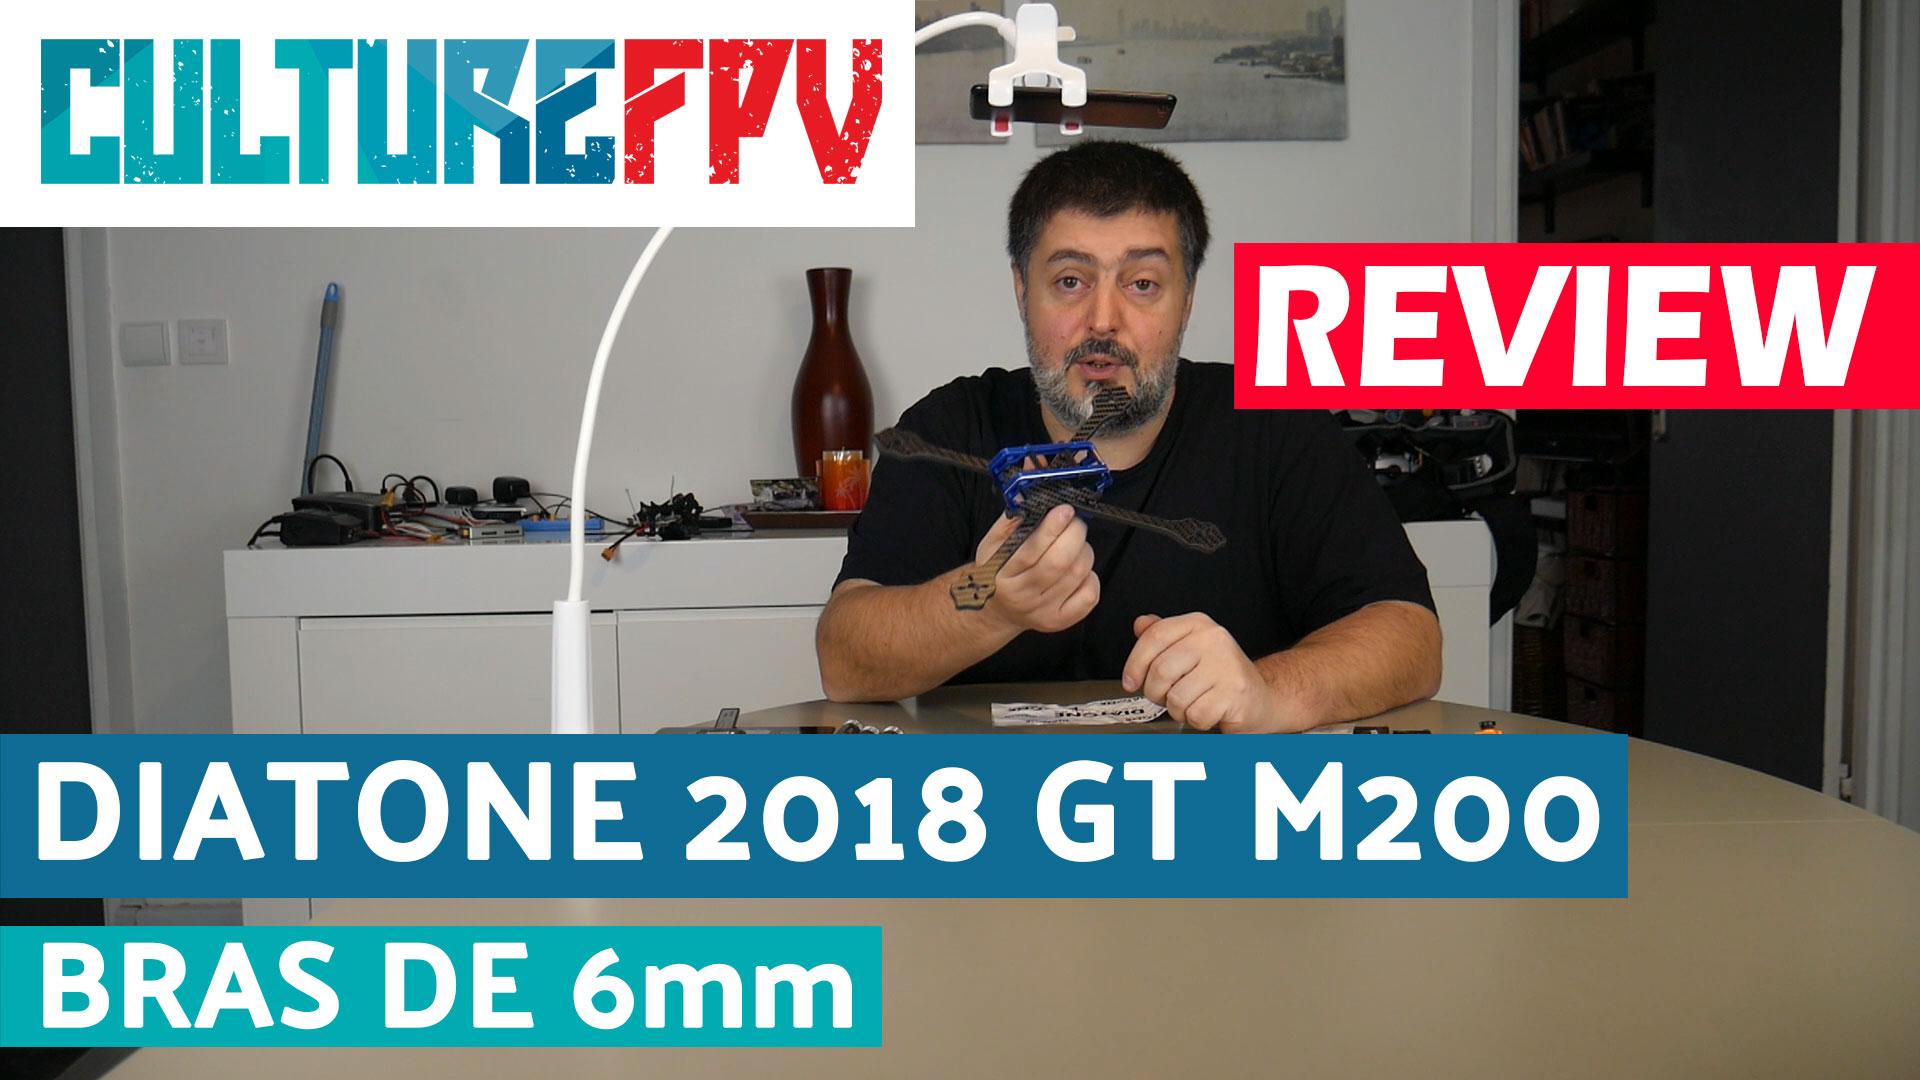 Diatone 2018 GT M200